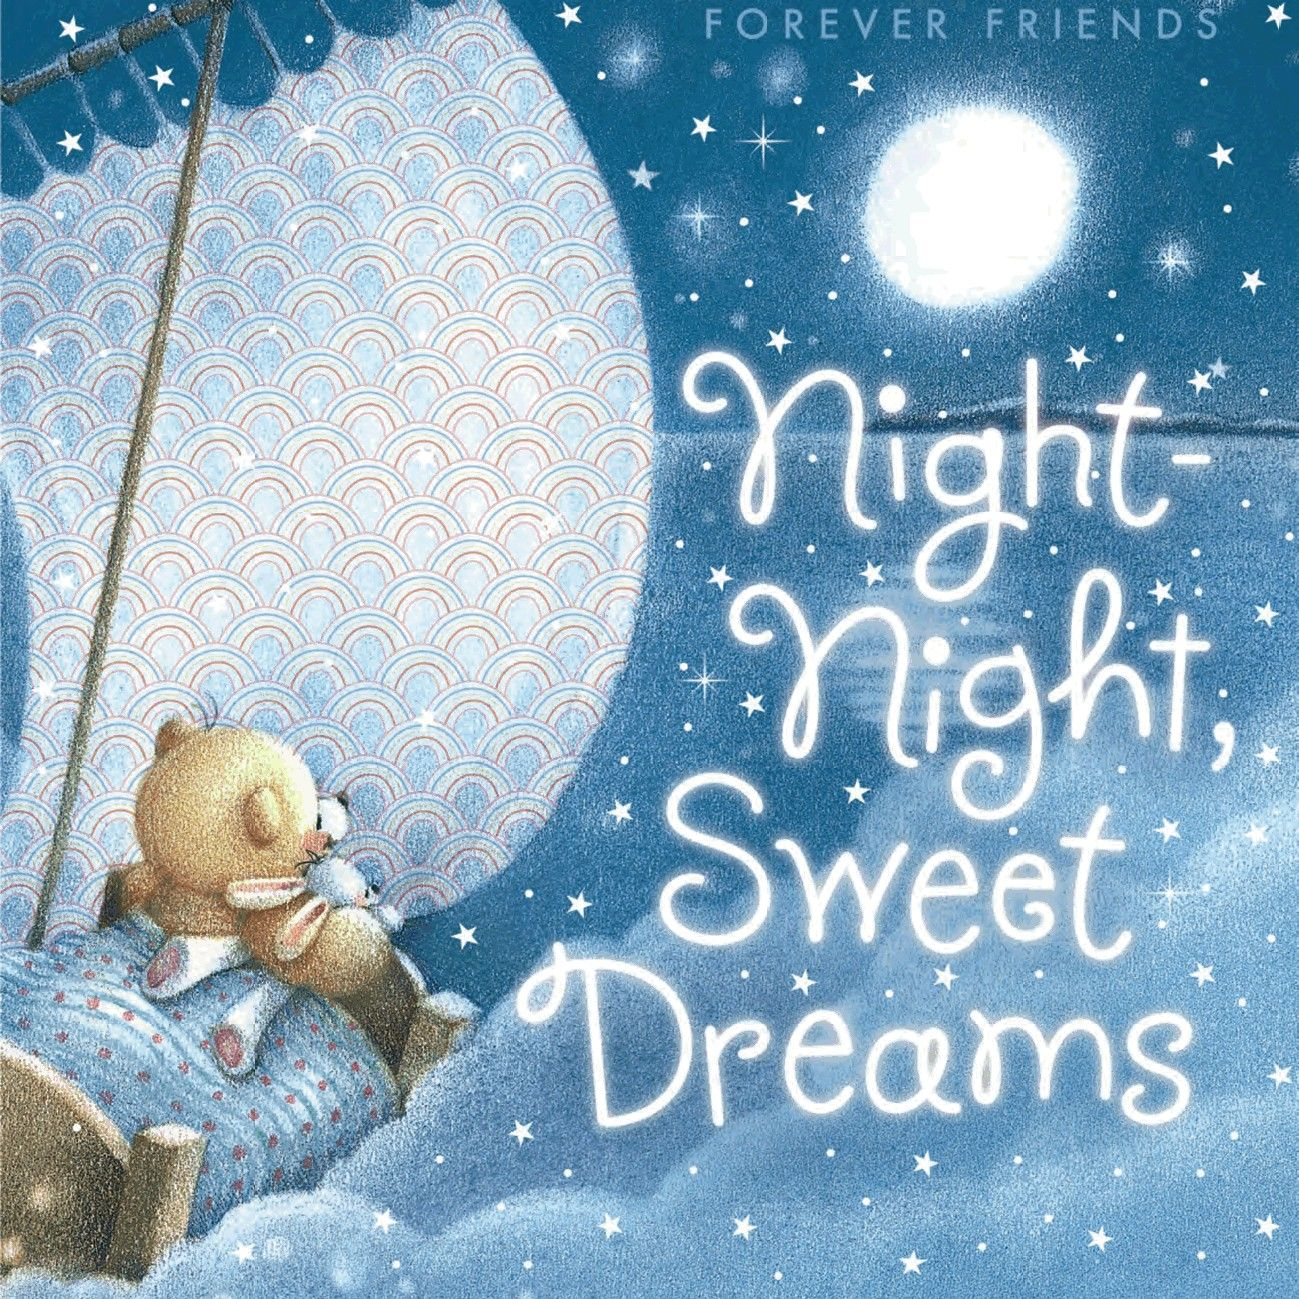 Animated Good Night Graphics | Night Night Sweet Dreams Image